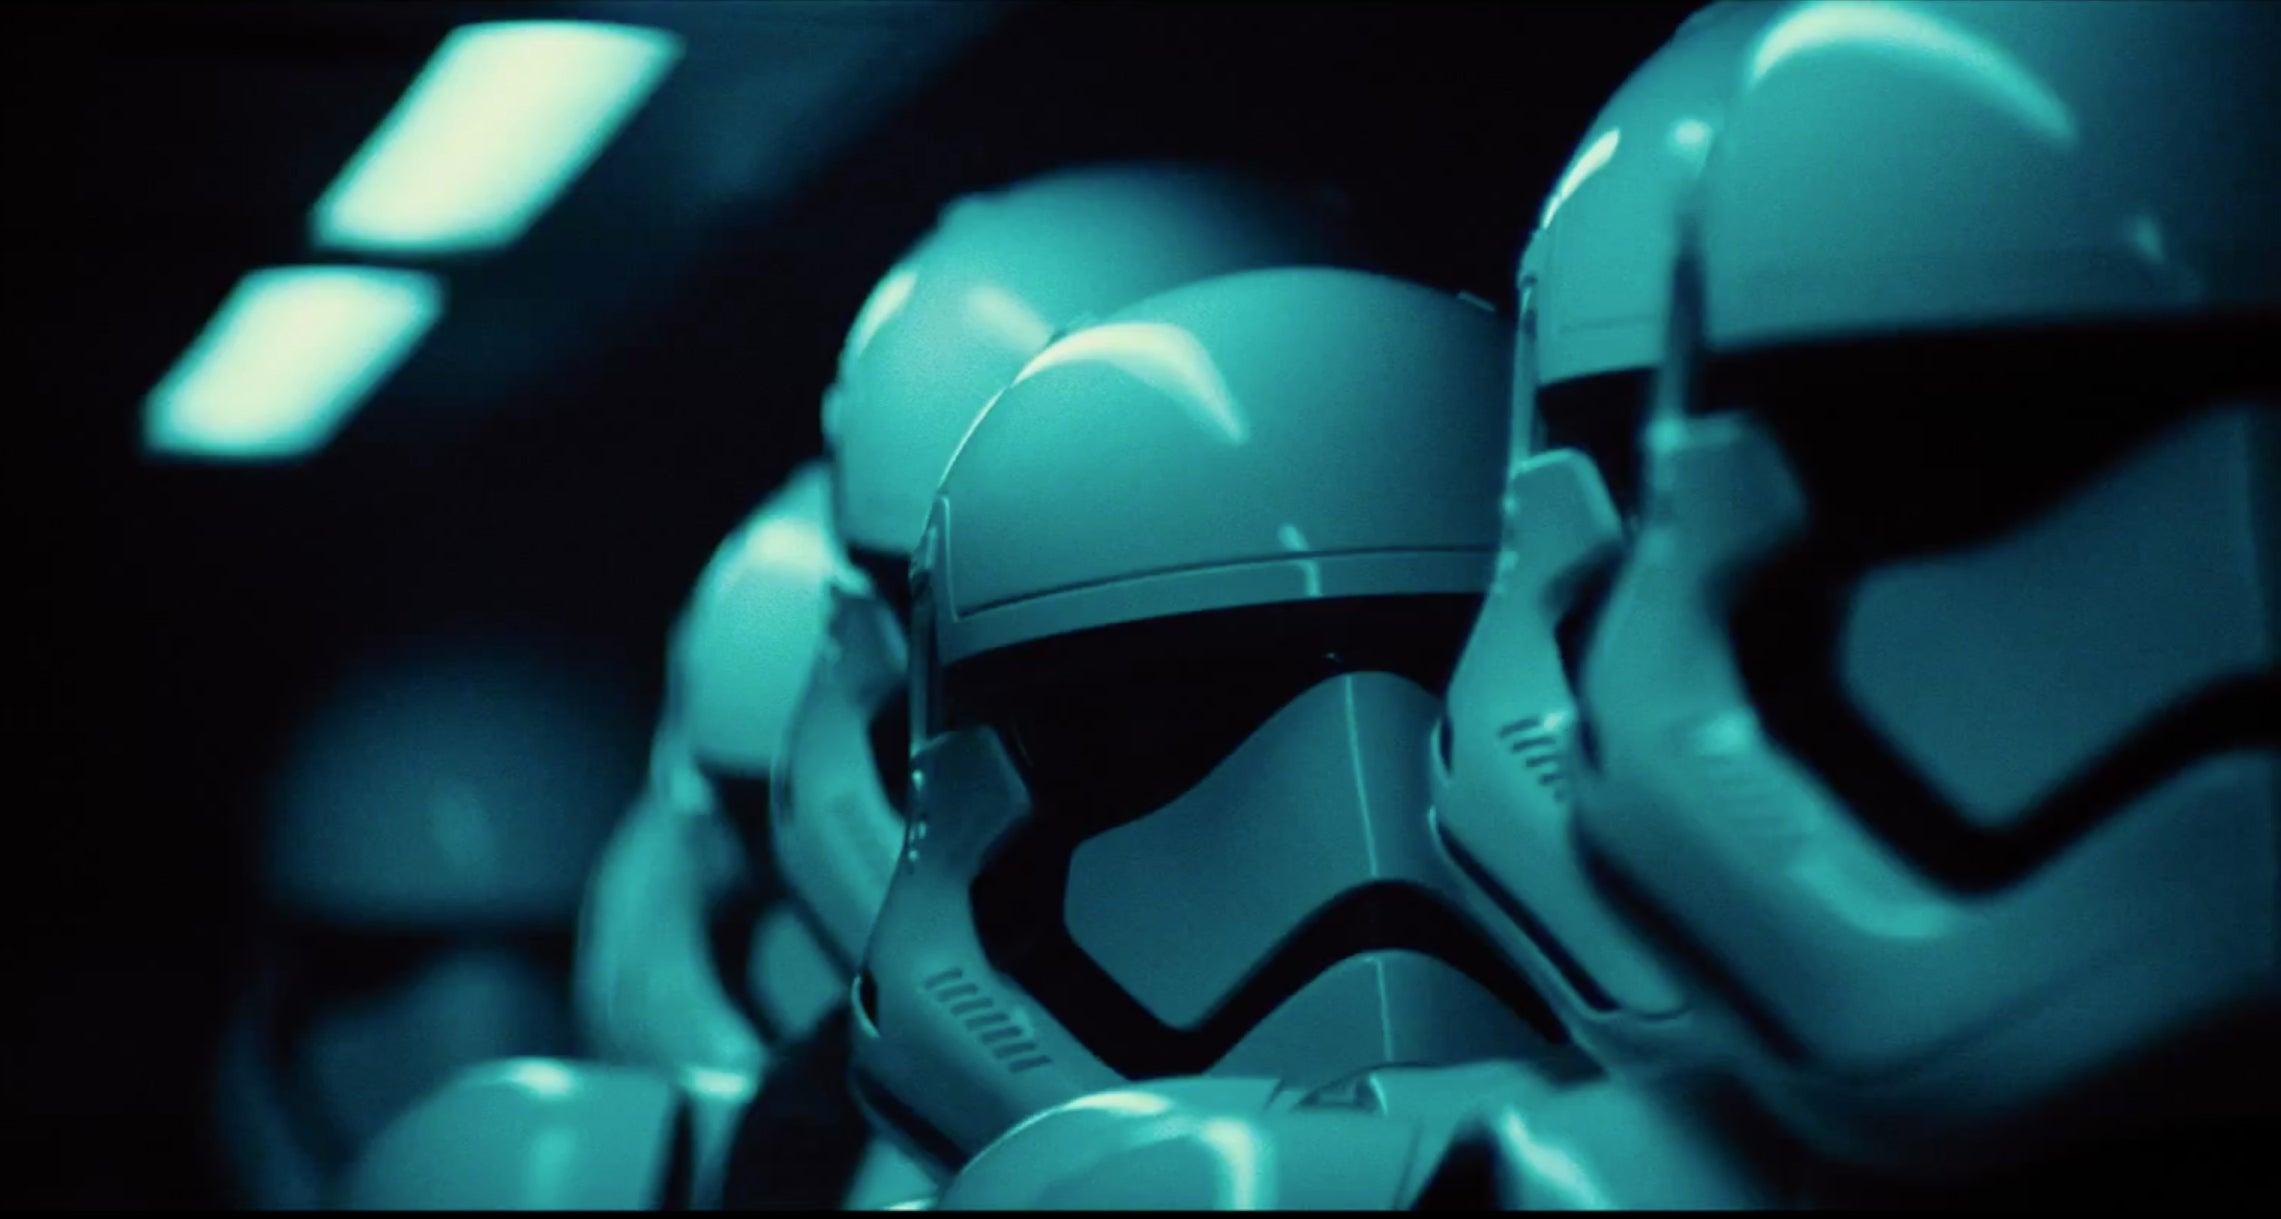 1 - Star Wars The Force Awakens